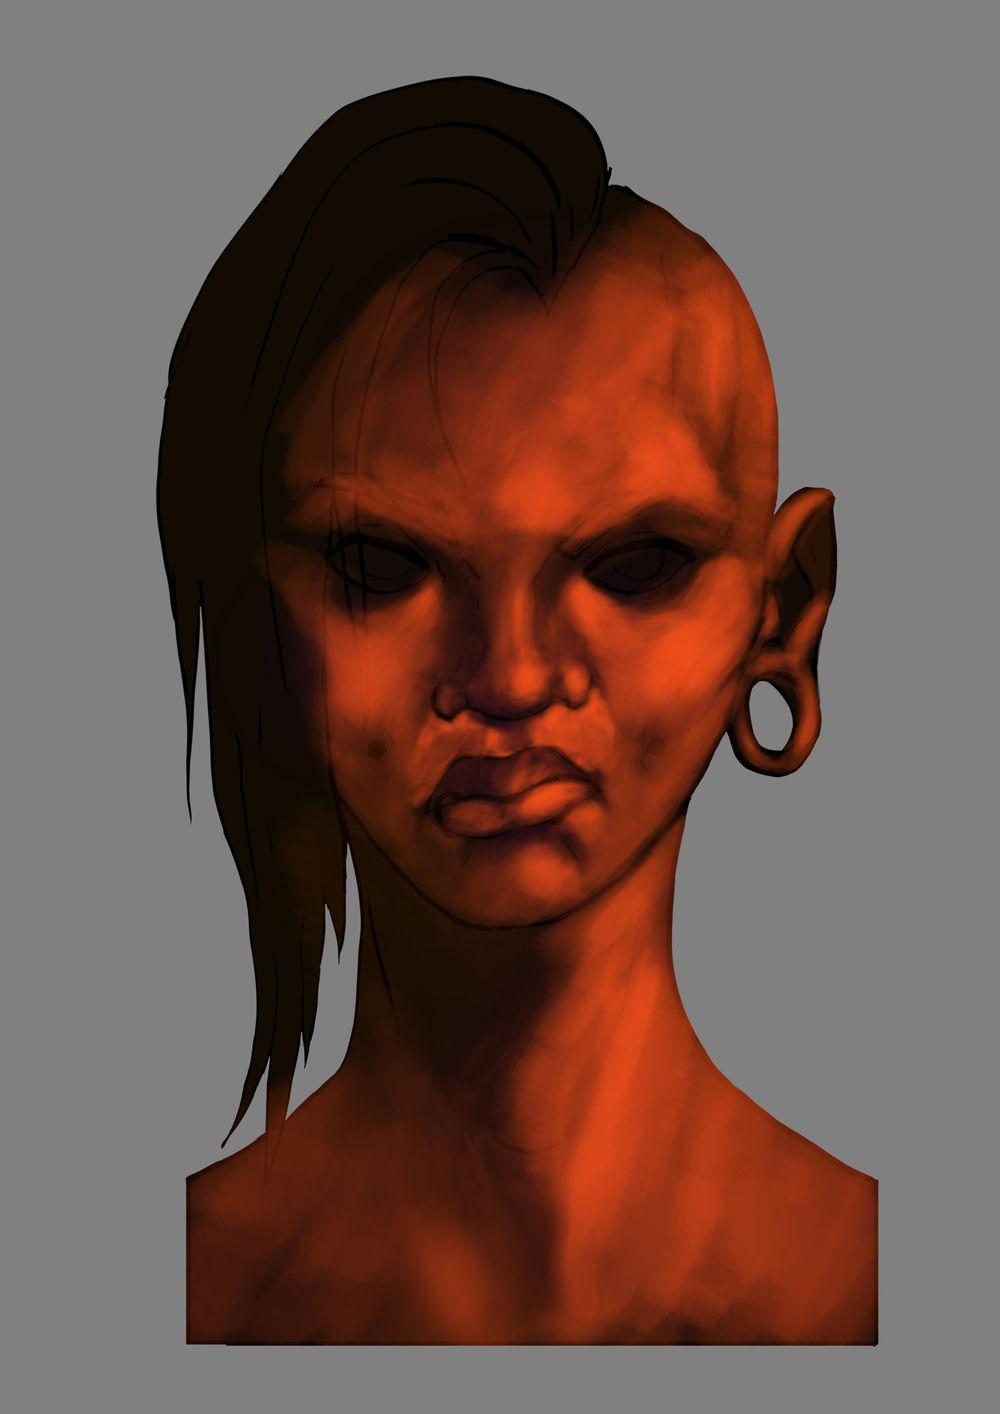 Head Study (Male, Female, Villain, Punk Girl, Buddy) - image 14 - student project